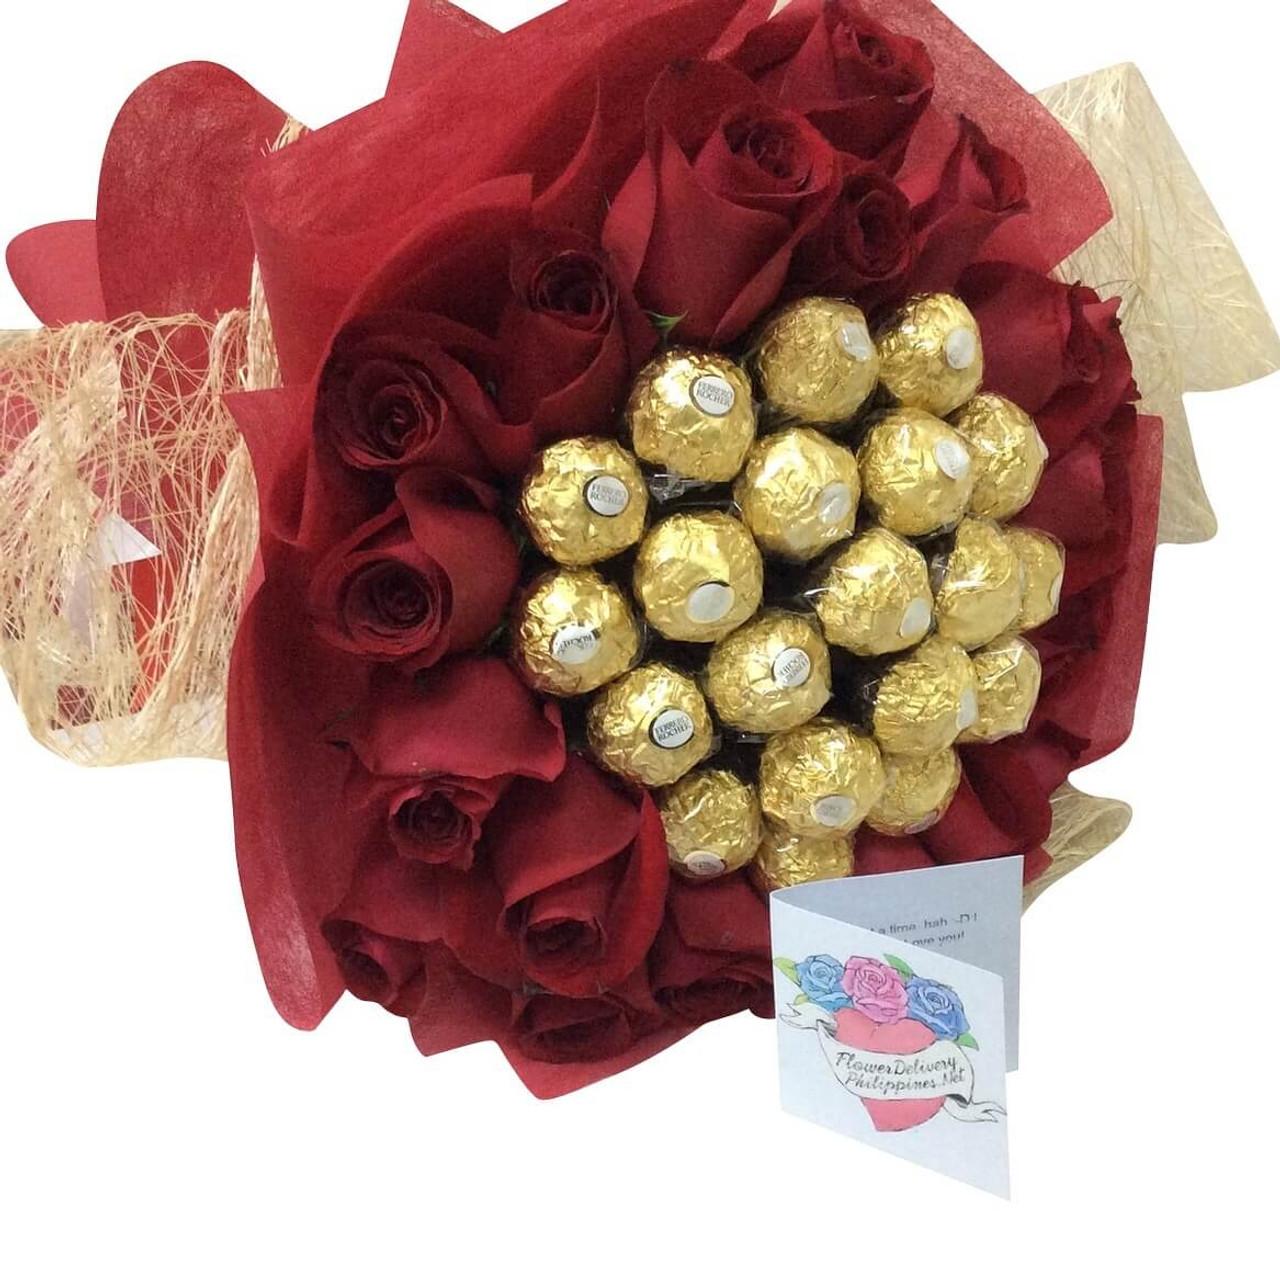 20 XL Roses & 20 Ferrero Bouquet